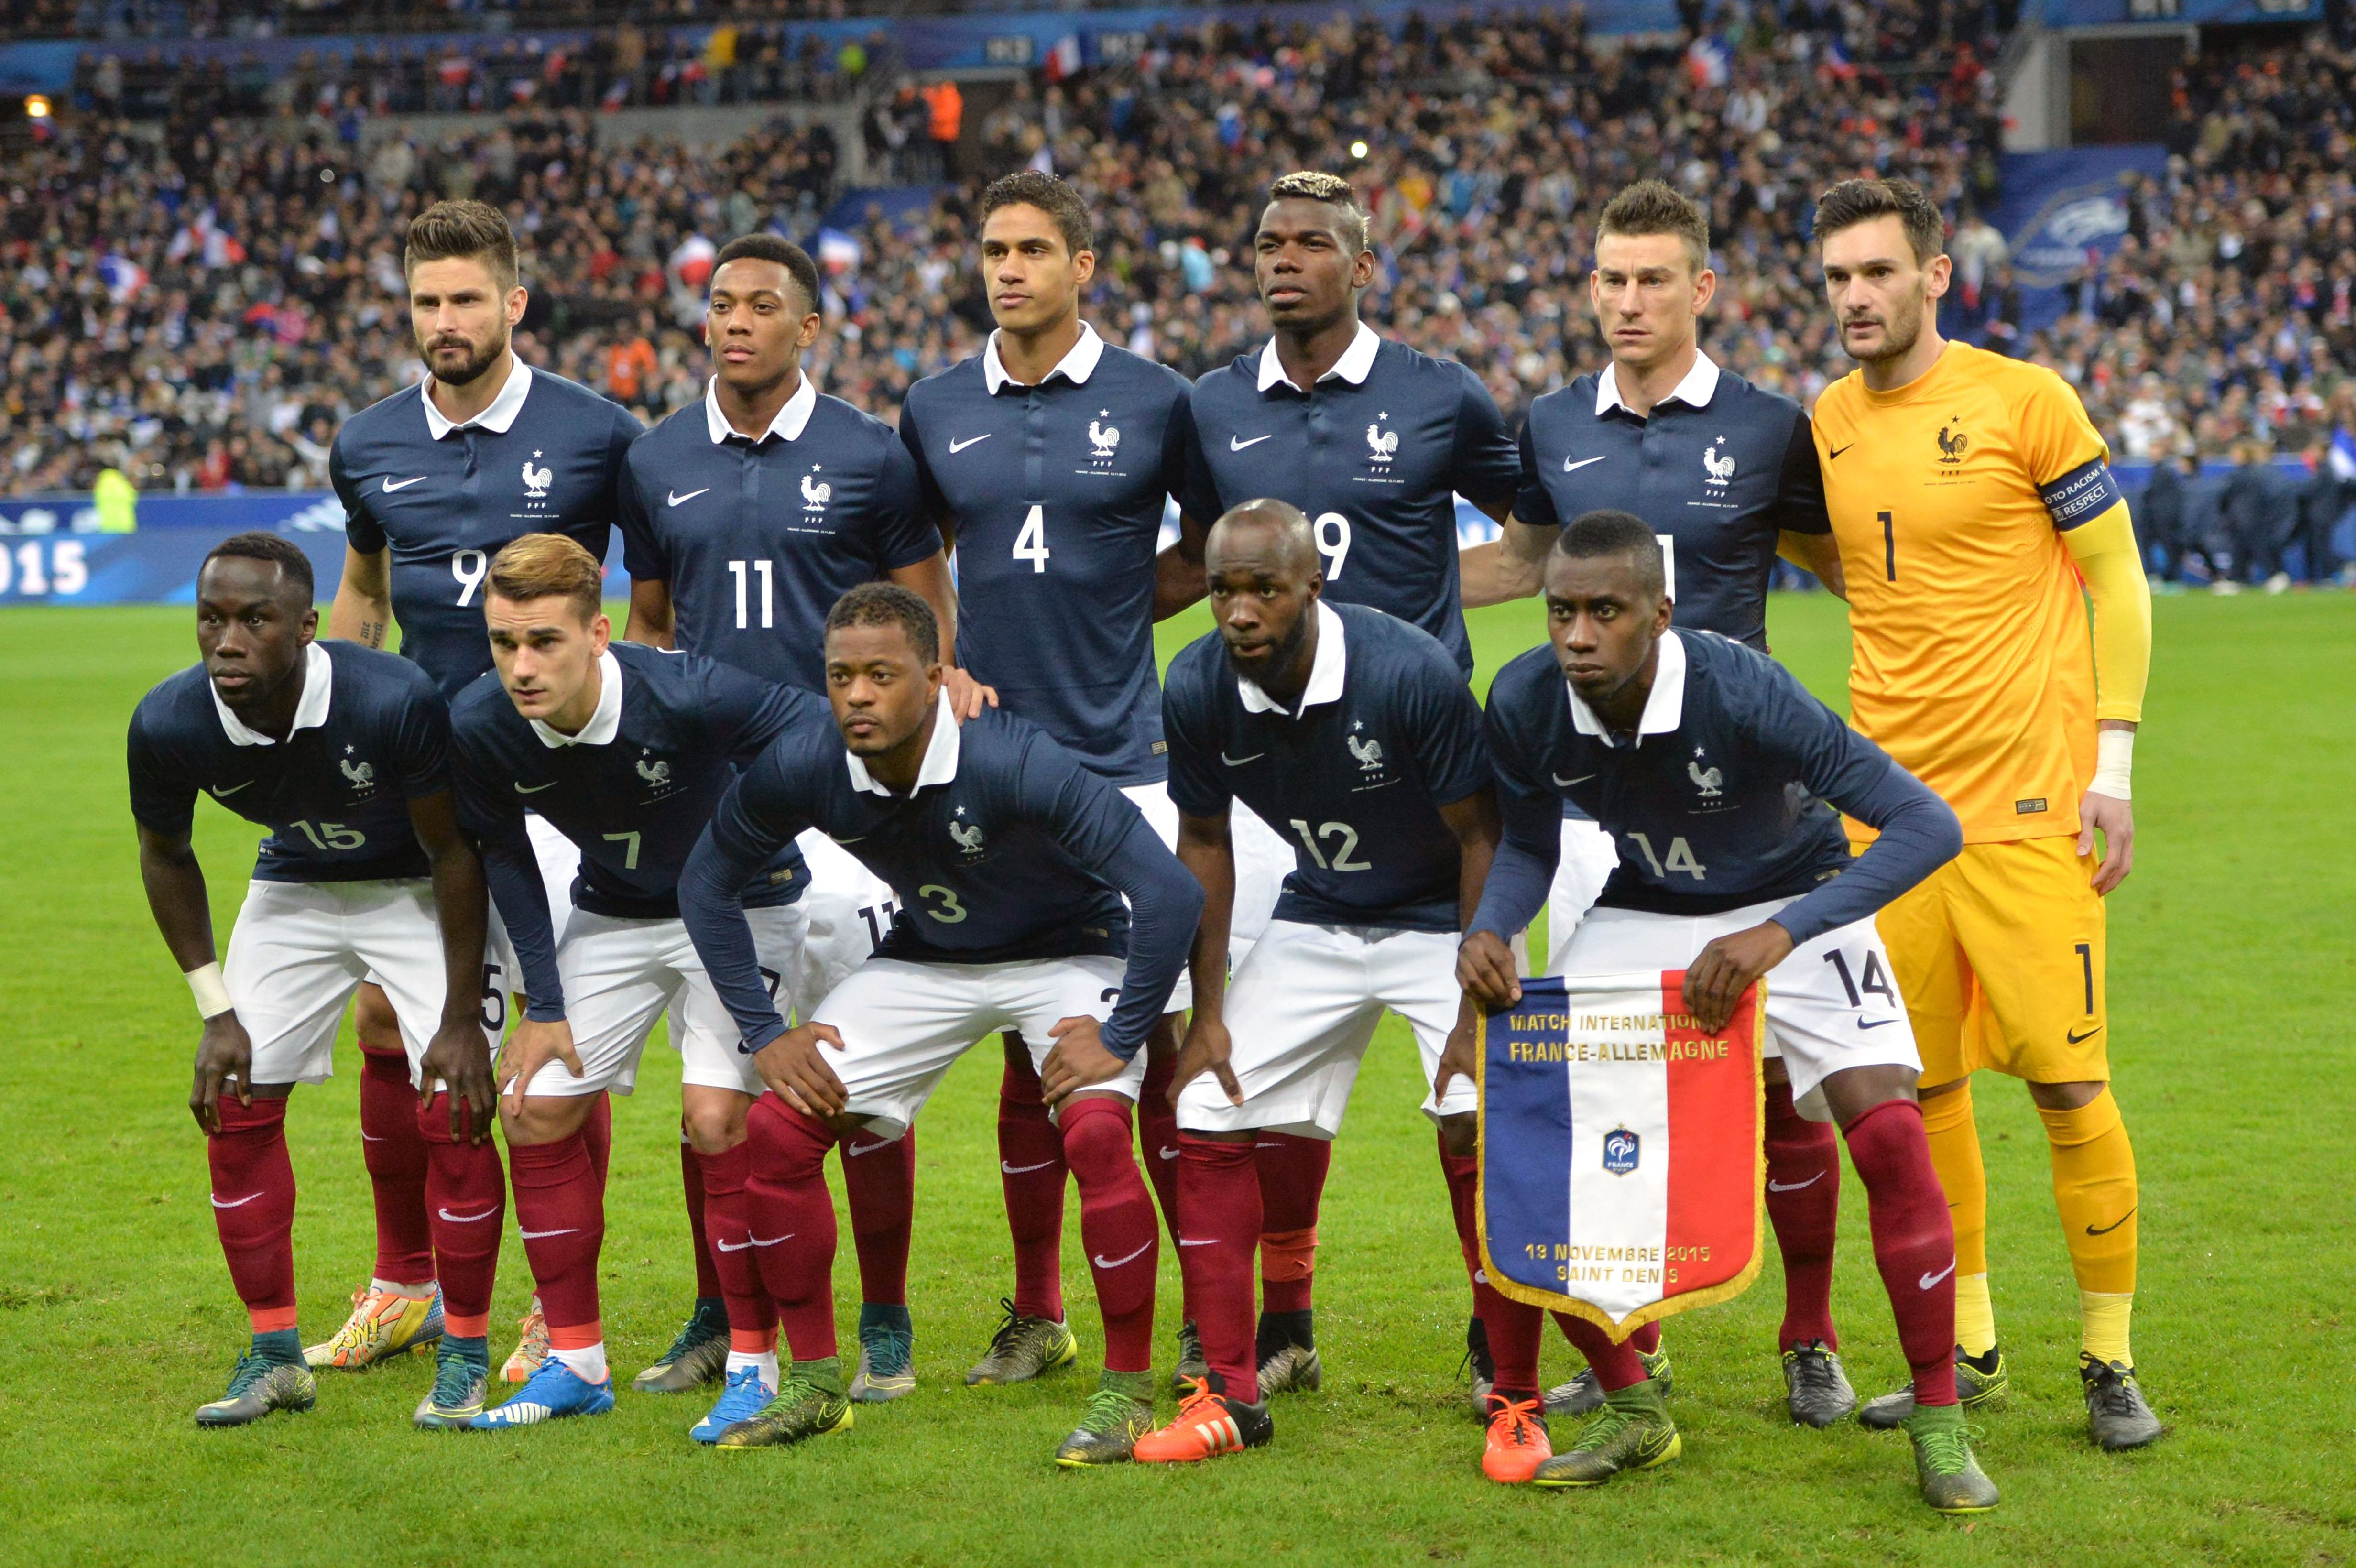 Malgre-les-attentats-le-match-Angleterre-France-maintenu-mardi